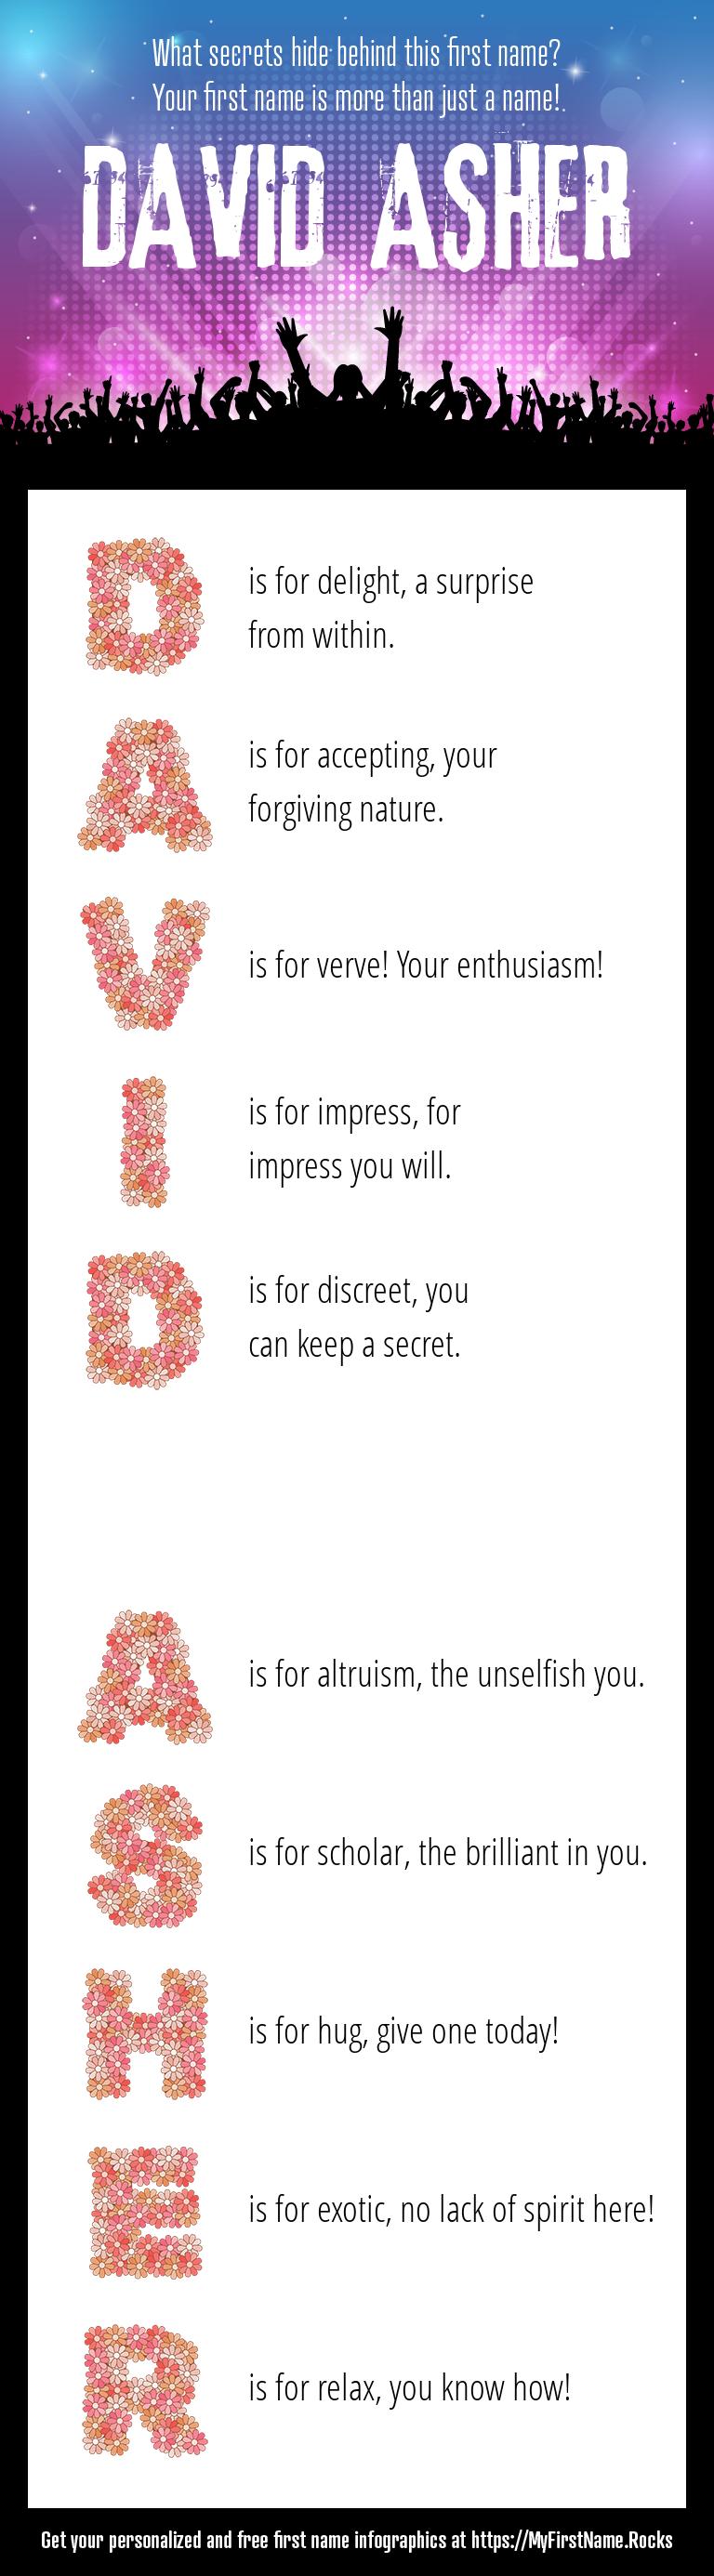 David Asher Infographics